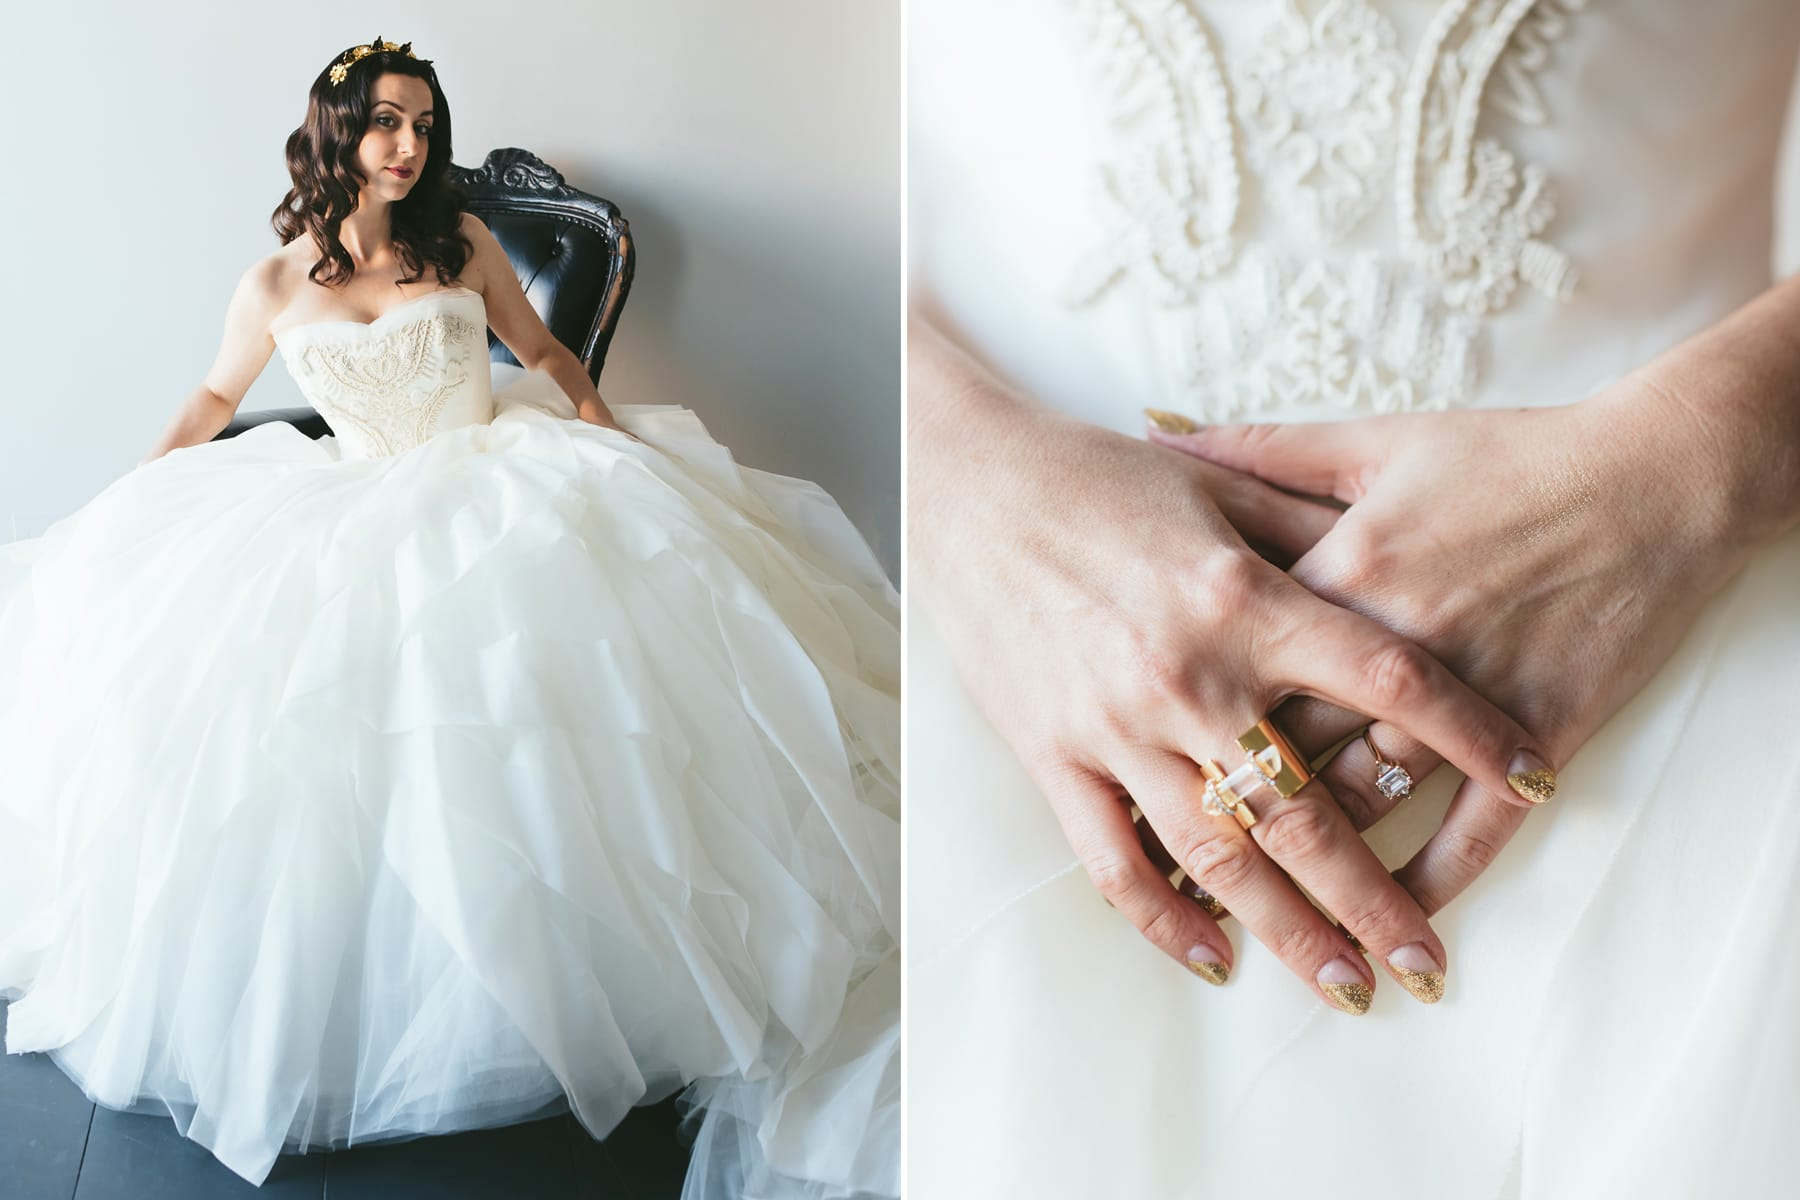 East village wedding photographer